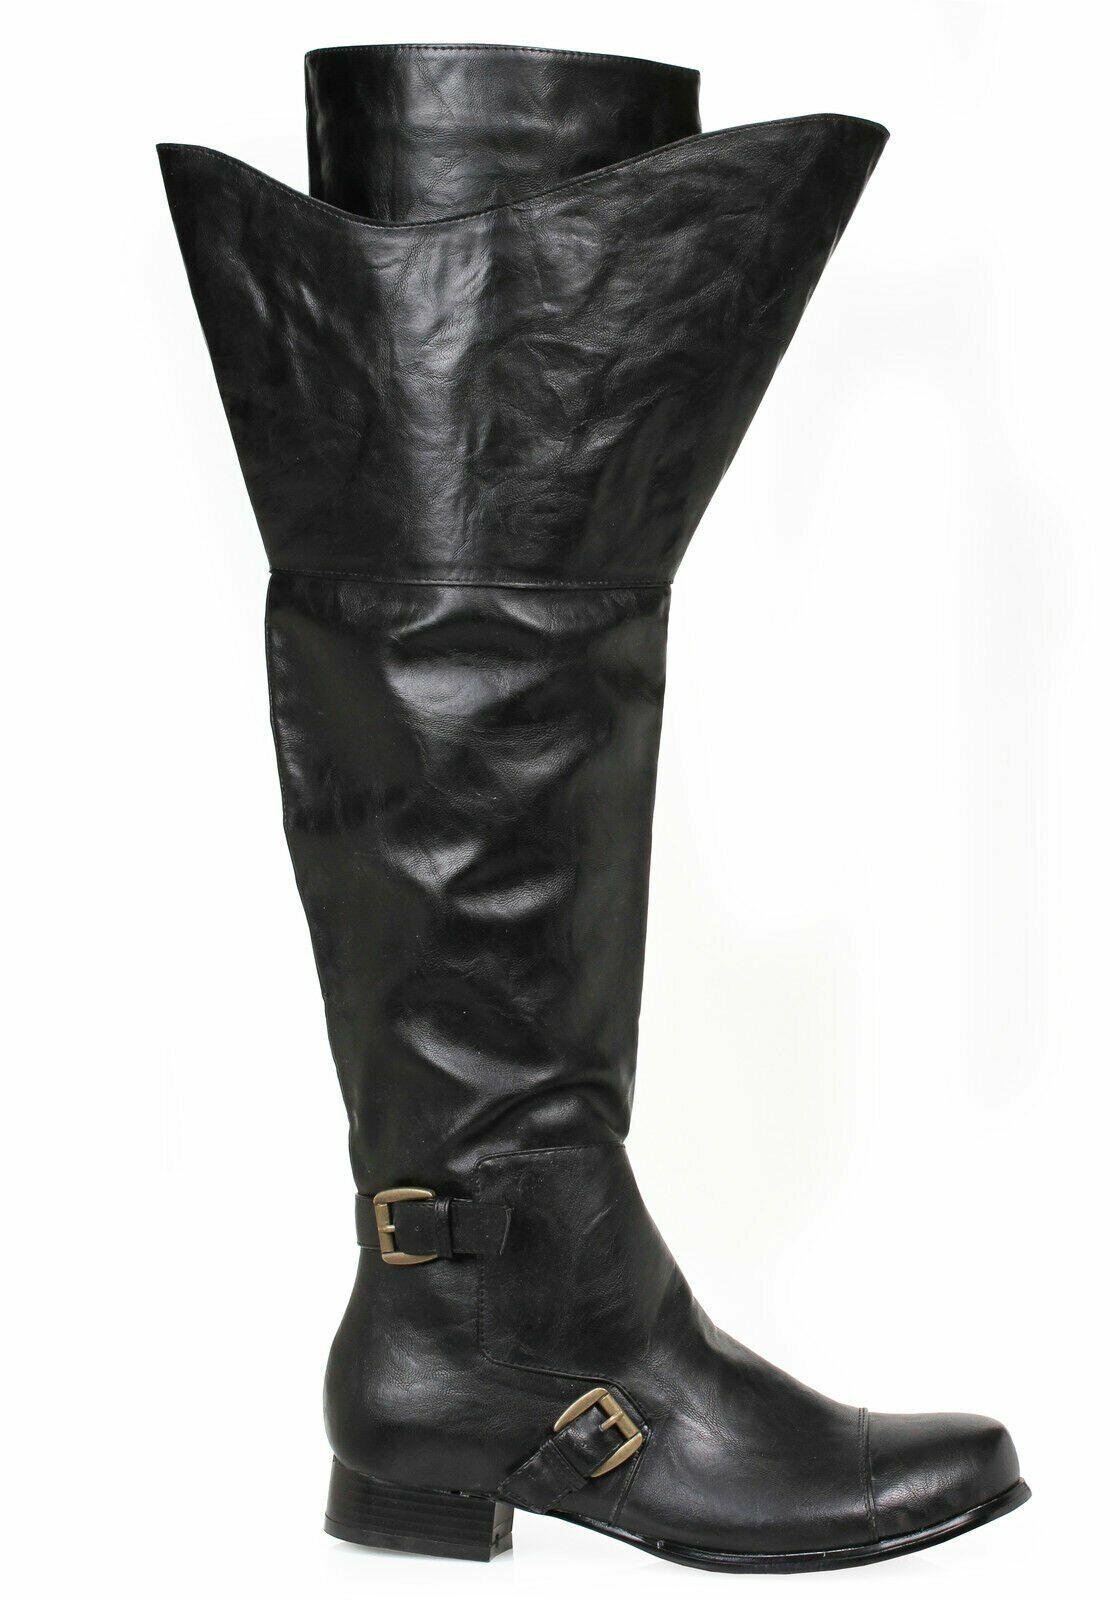 Ellie zapatos 121 Tallas para Hombres-Tristin Tacón de 1 pulgadas